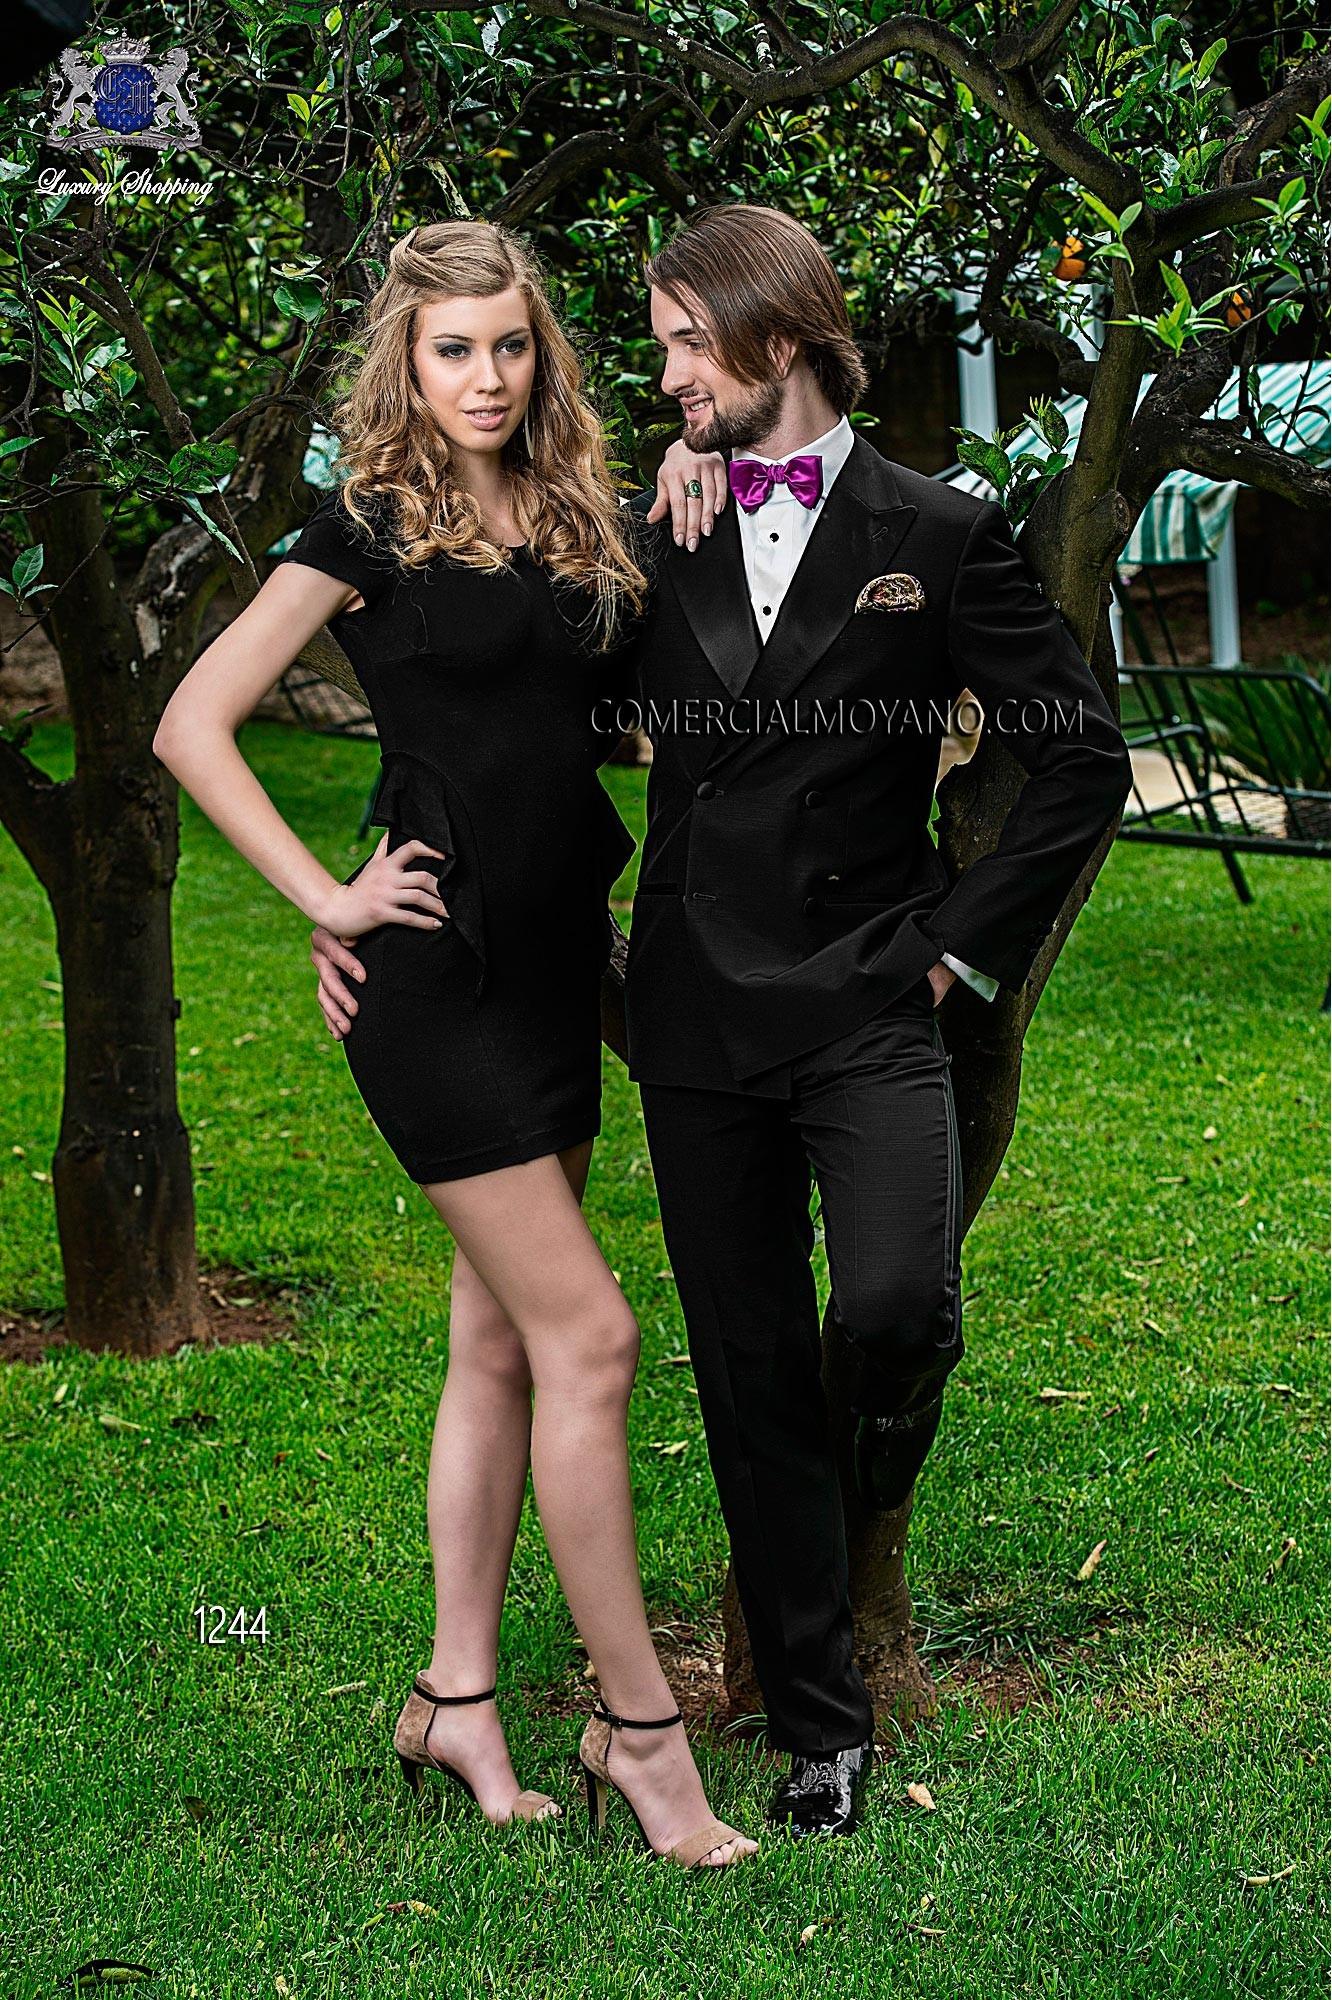 Black Tie black men wedding suit model 1244 Ottavio Nuccio Gala